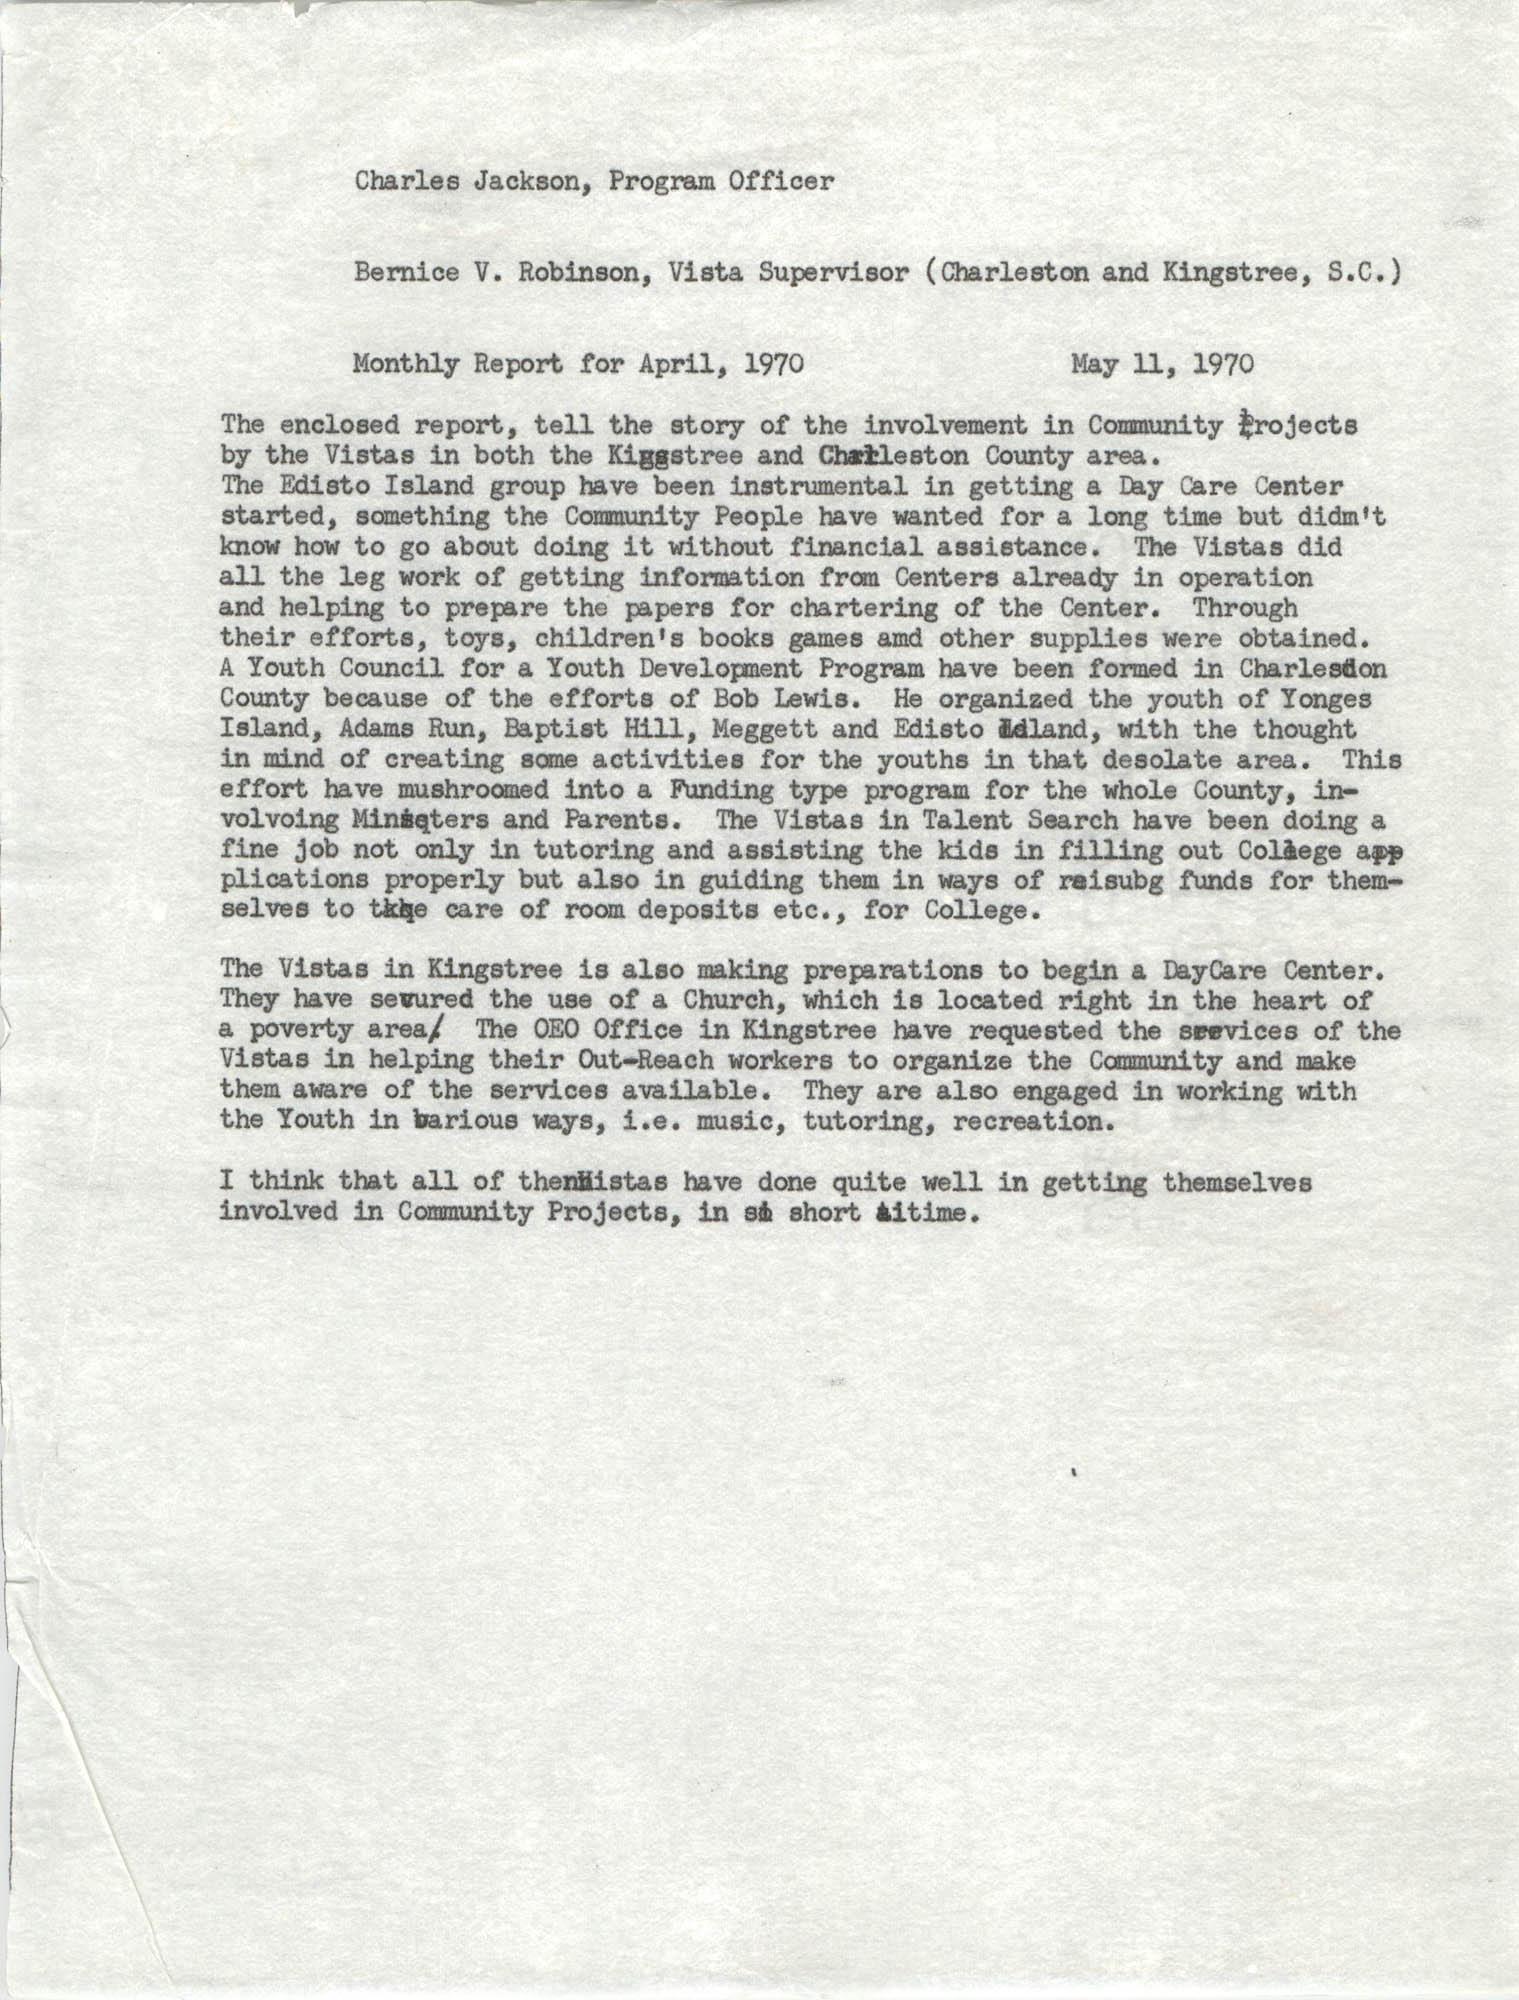 VISTA Memorandum, Monthly Progress Report, April 1970